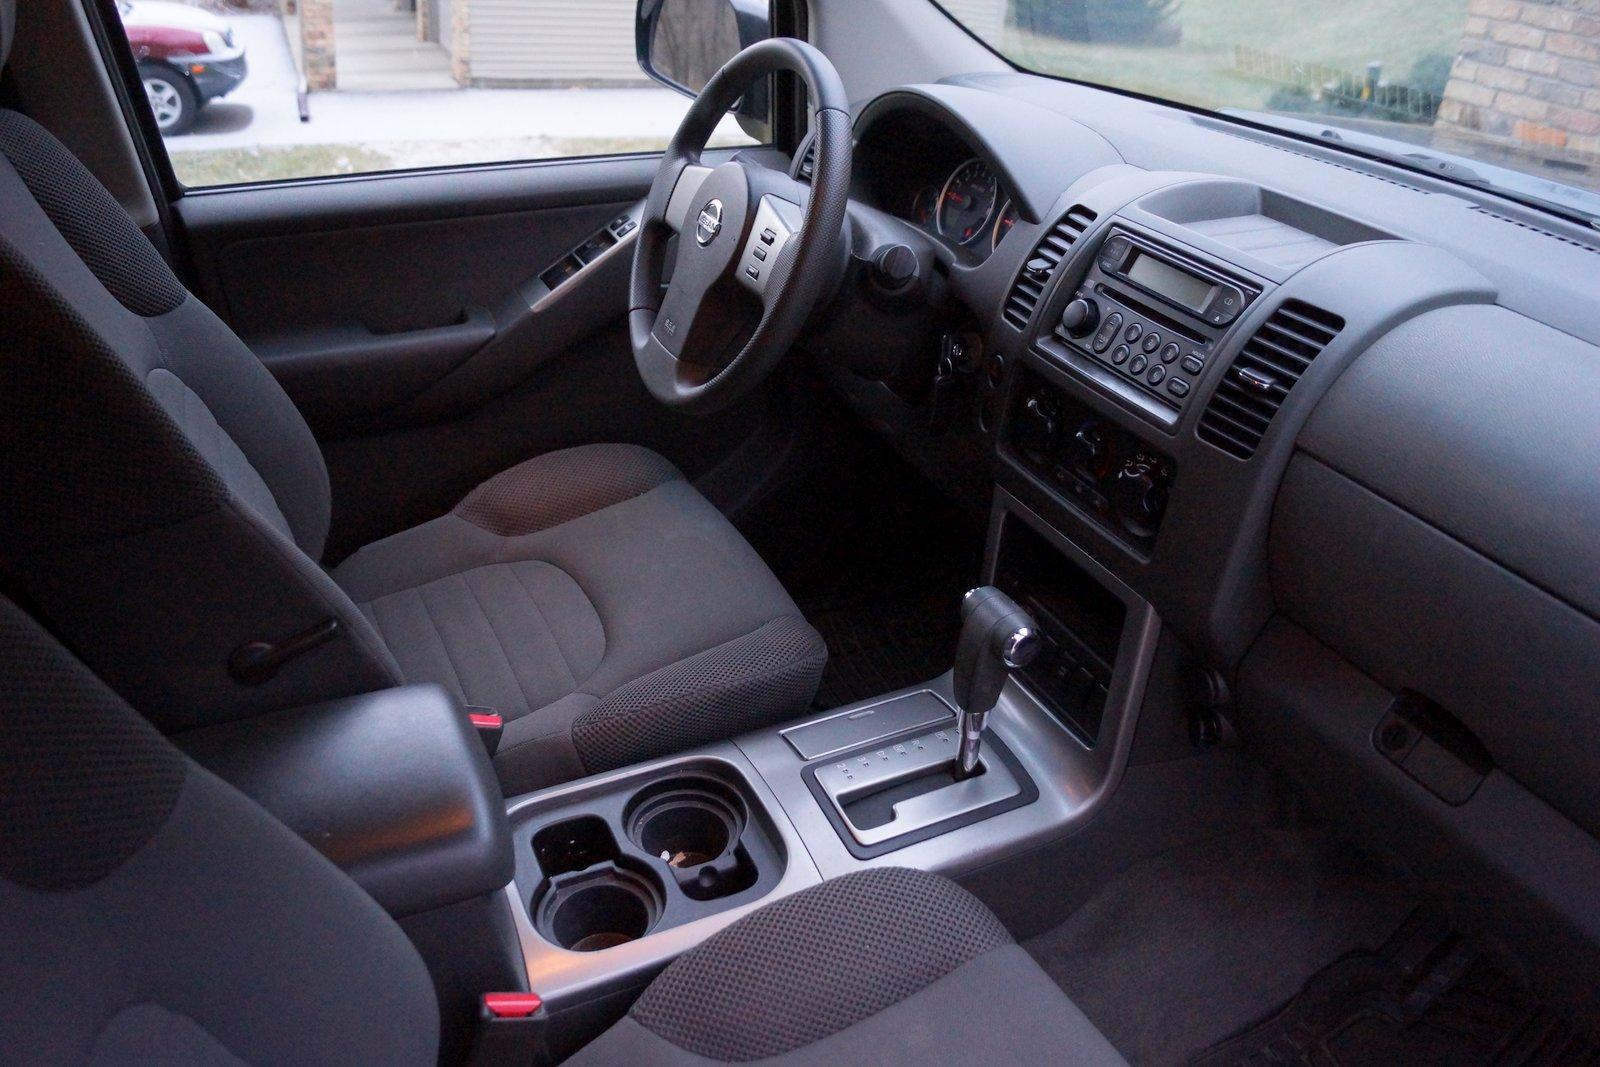 2006 Nissan Pathfinder Pictures Cargurus